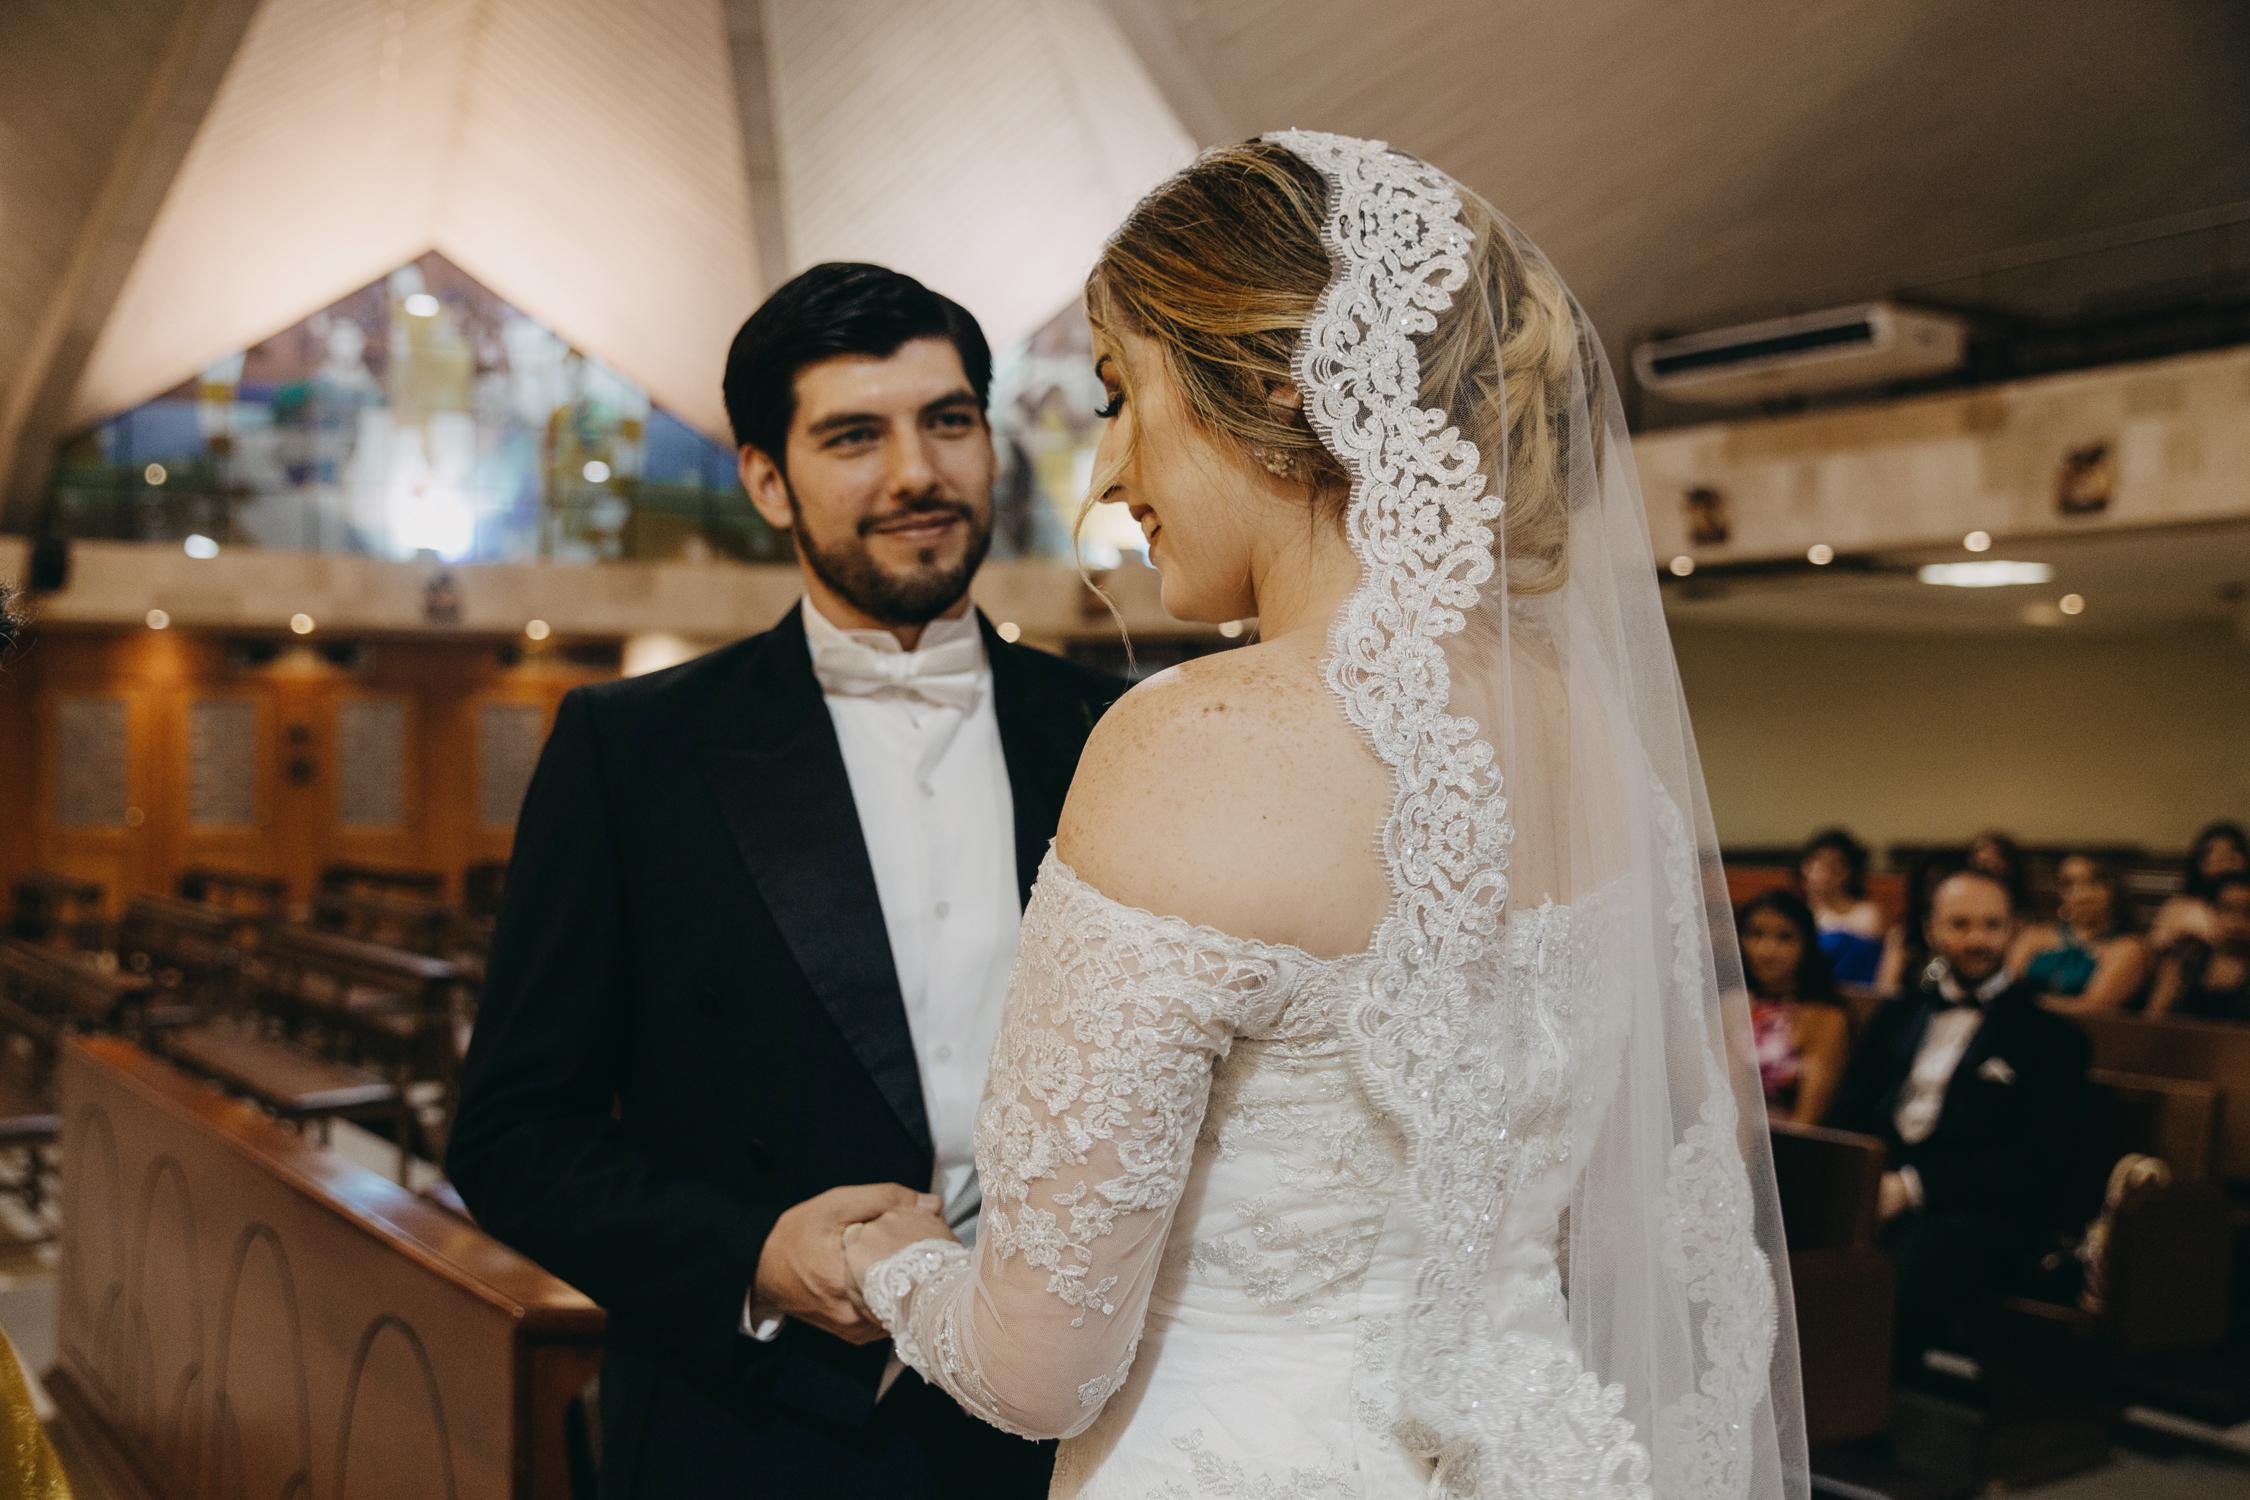 Michelle-Agurto-Fotografia-Bodas-Ecuador-Destination-Wedding-Photographer-Vicky-Javier-75.JPG